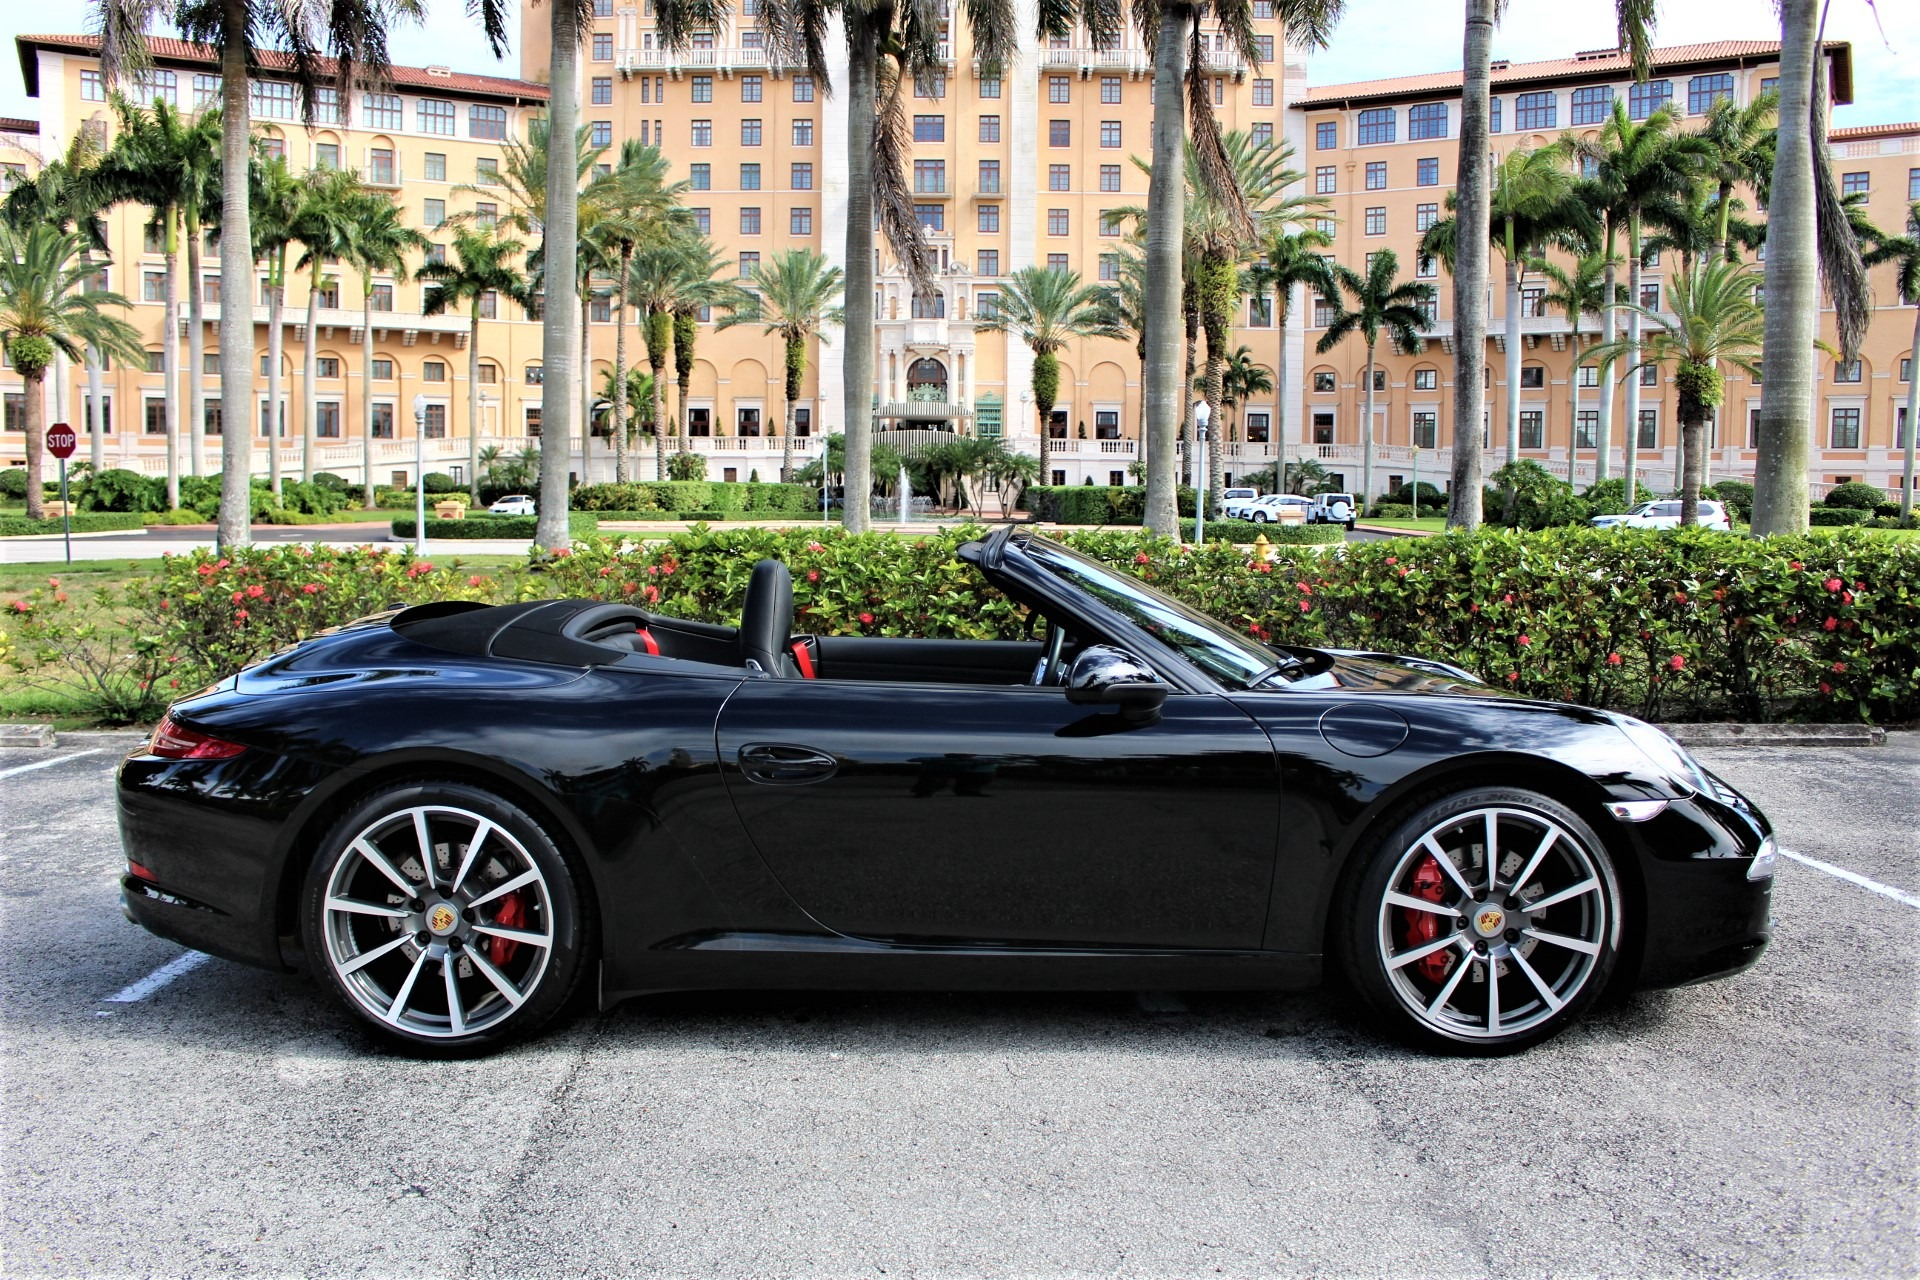 Used 2013 Porsche 911 Carrera S for sale $85,850 at The Gables Sports Cars in Miami FL 33146 1